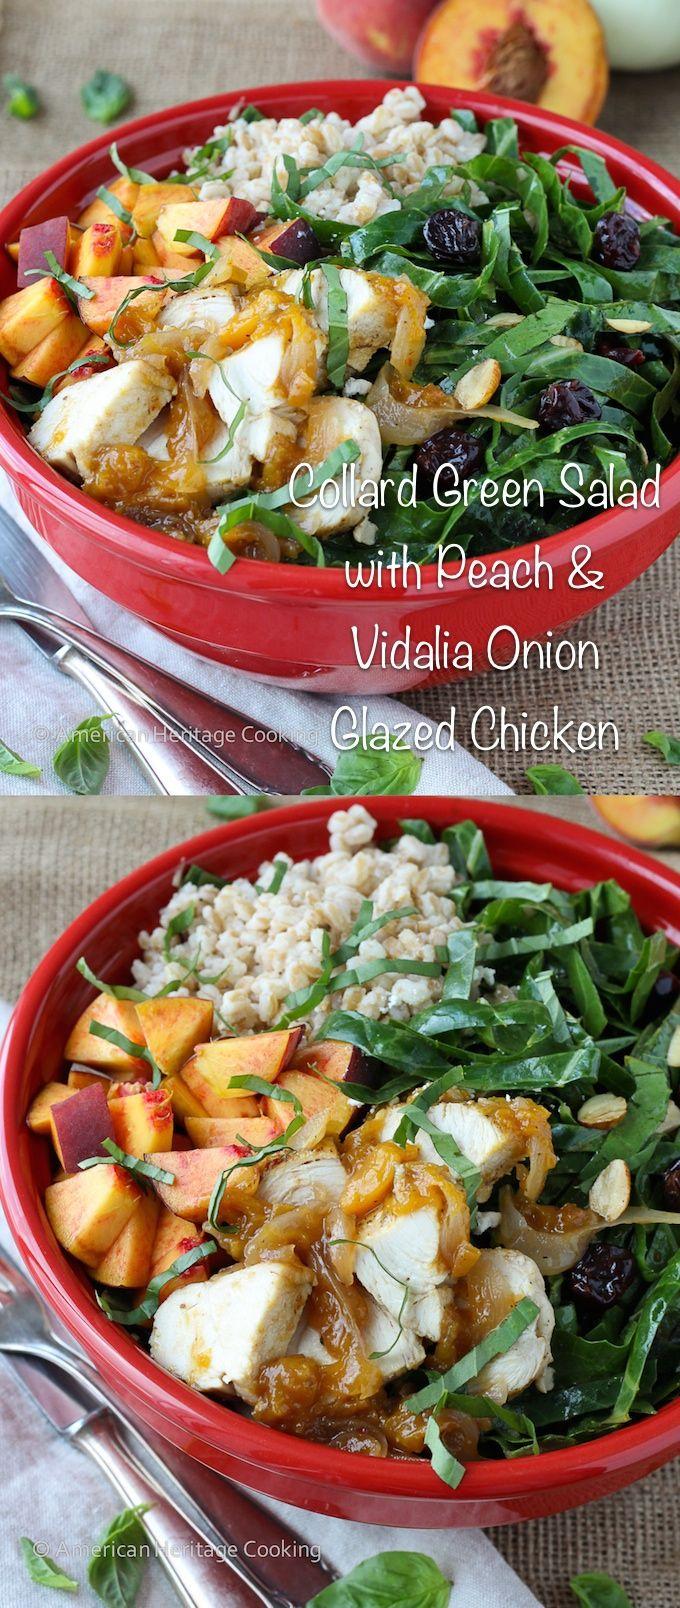 Collard Green Salad with Vidalia Onion Peach Glazed Chicken | aka The Peach State Salad | Healthy, filling and so delicious!!